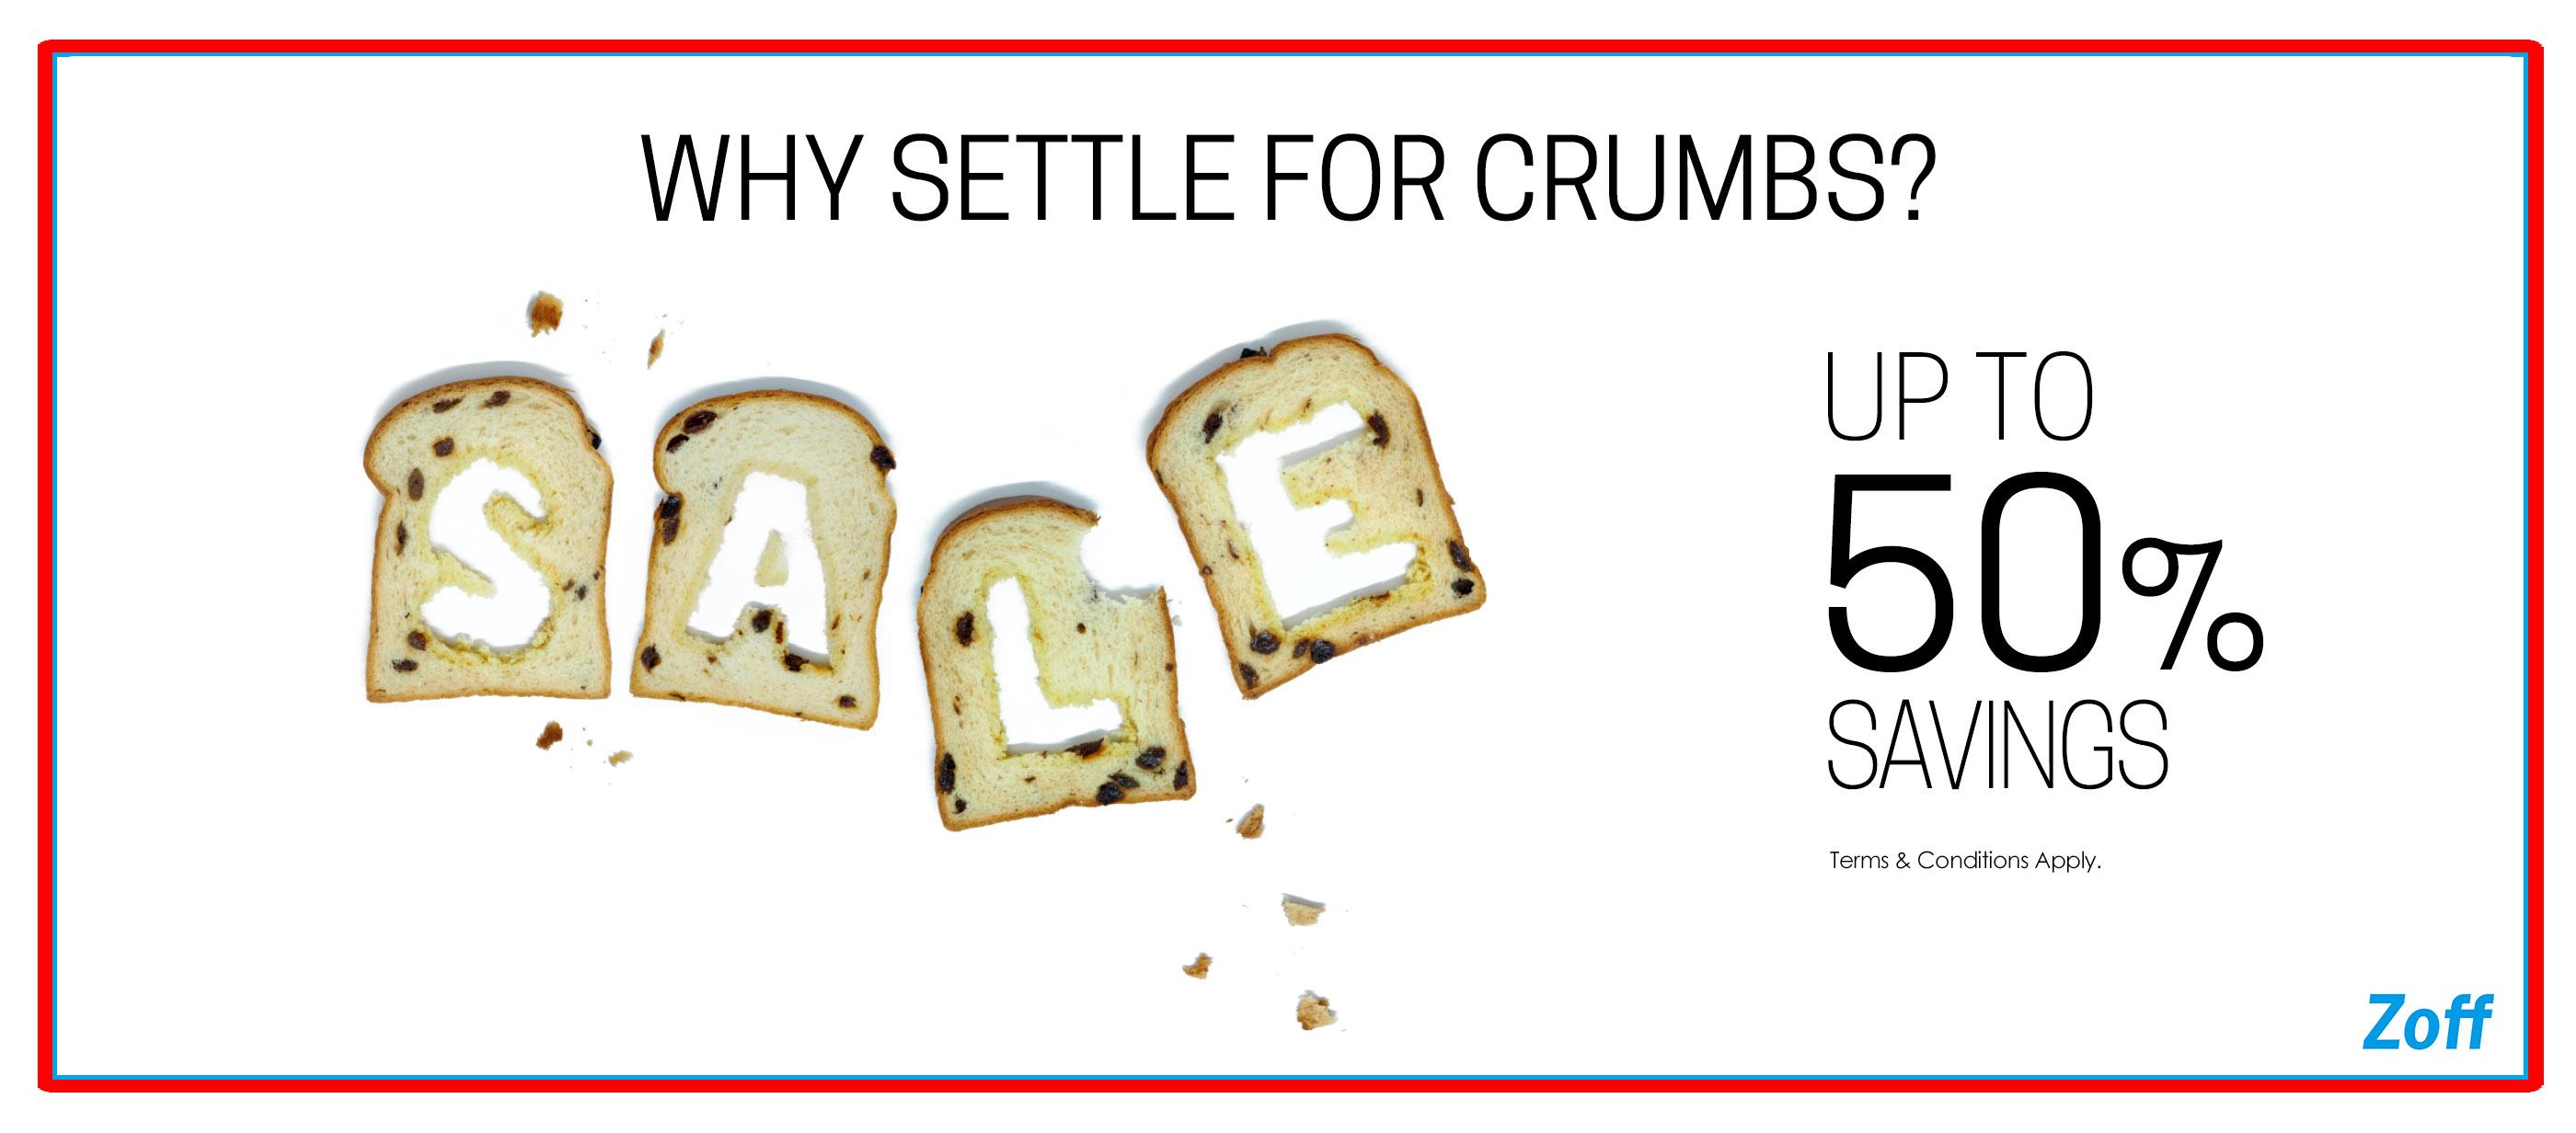 GSS 2018 Great Singapore Sale 50% Savings